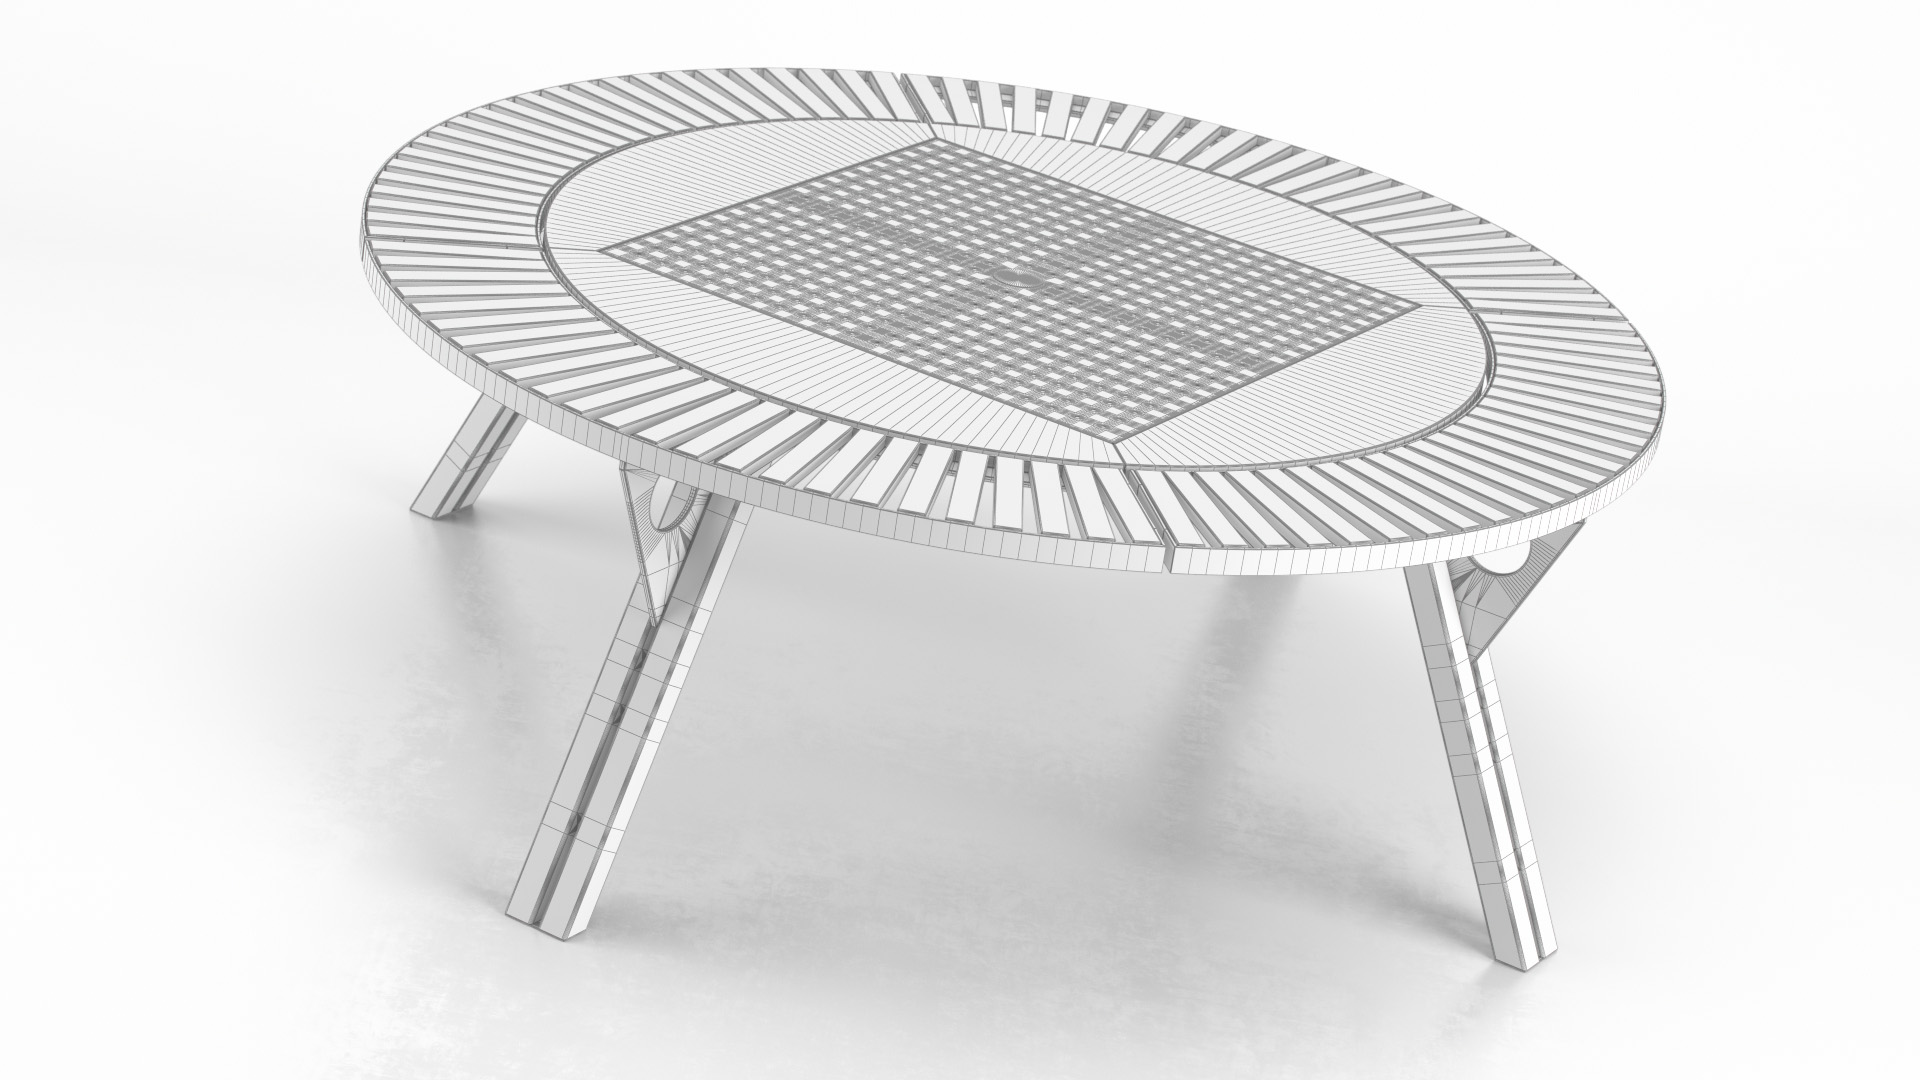 Gargantua_Table_Mode2_WhiteSet_01_wire_0003